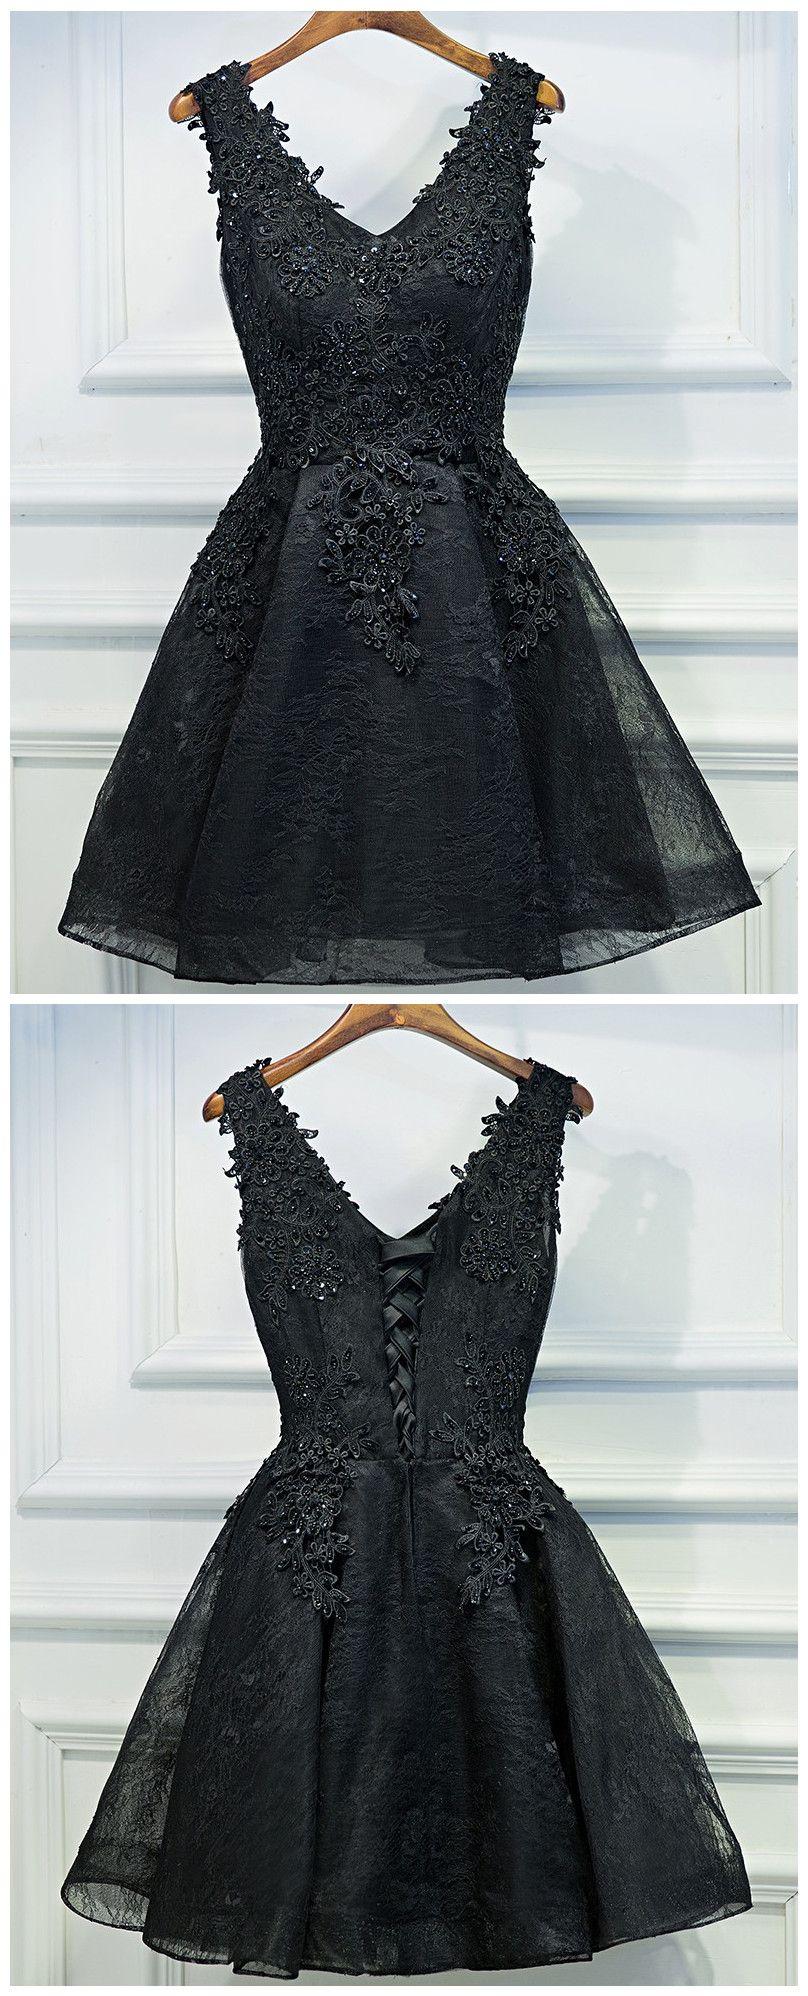 Black short prom dress black lace prom dress prom promdress